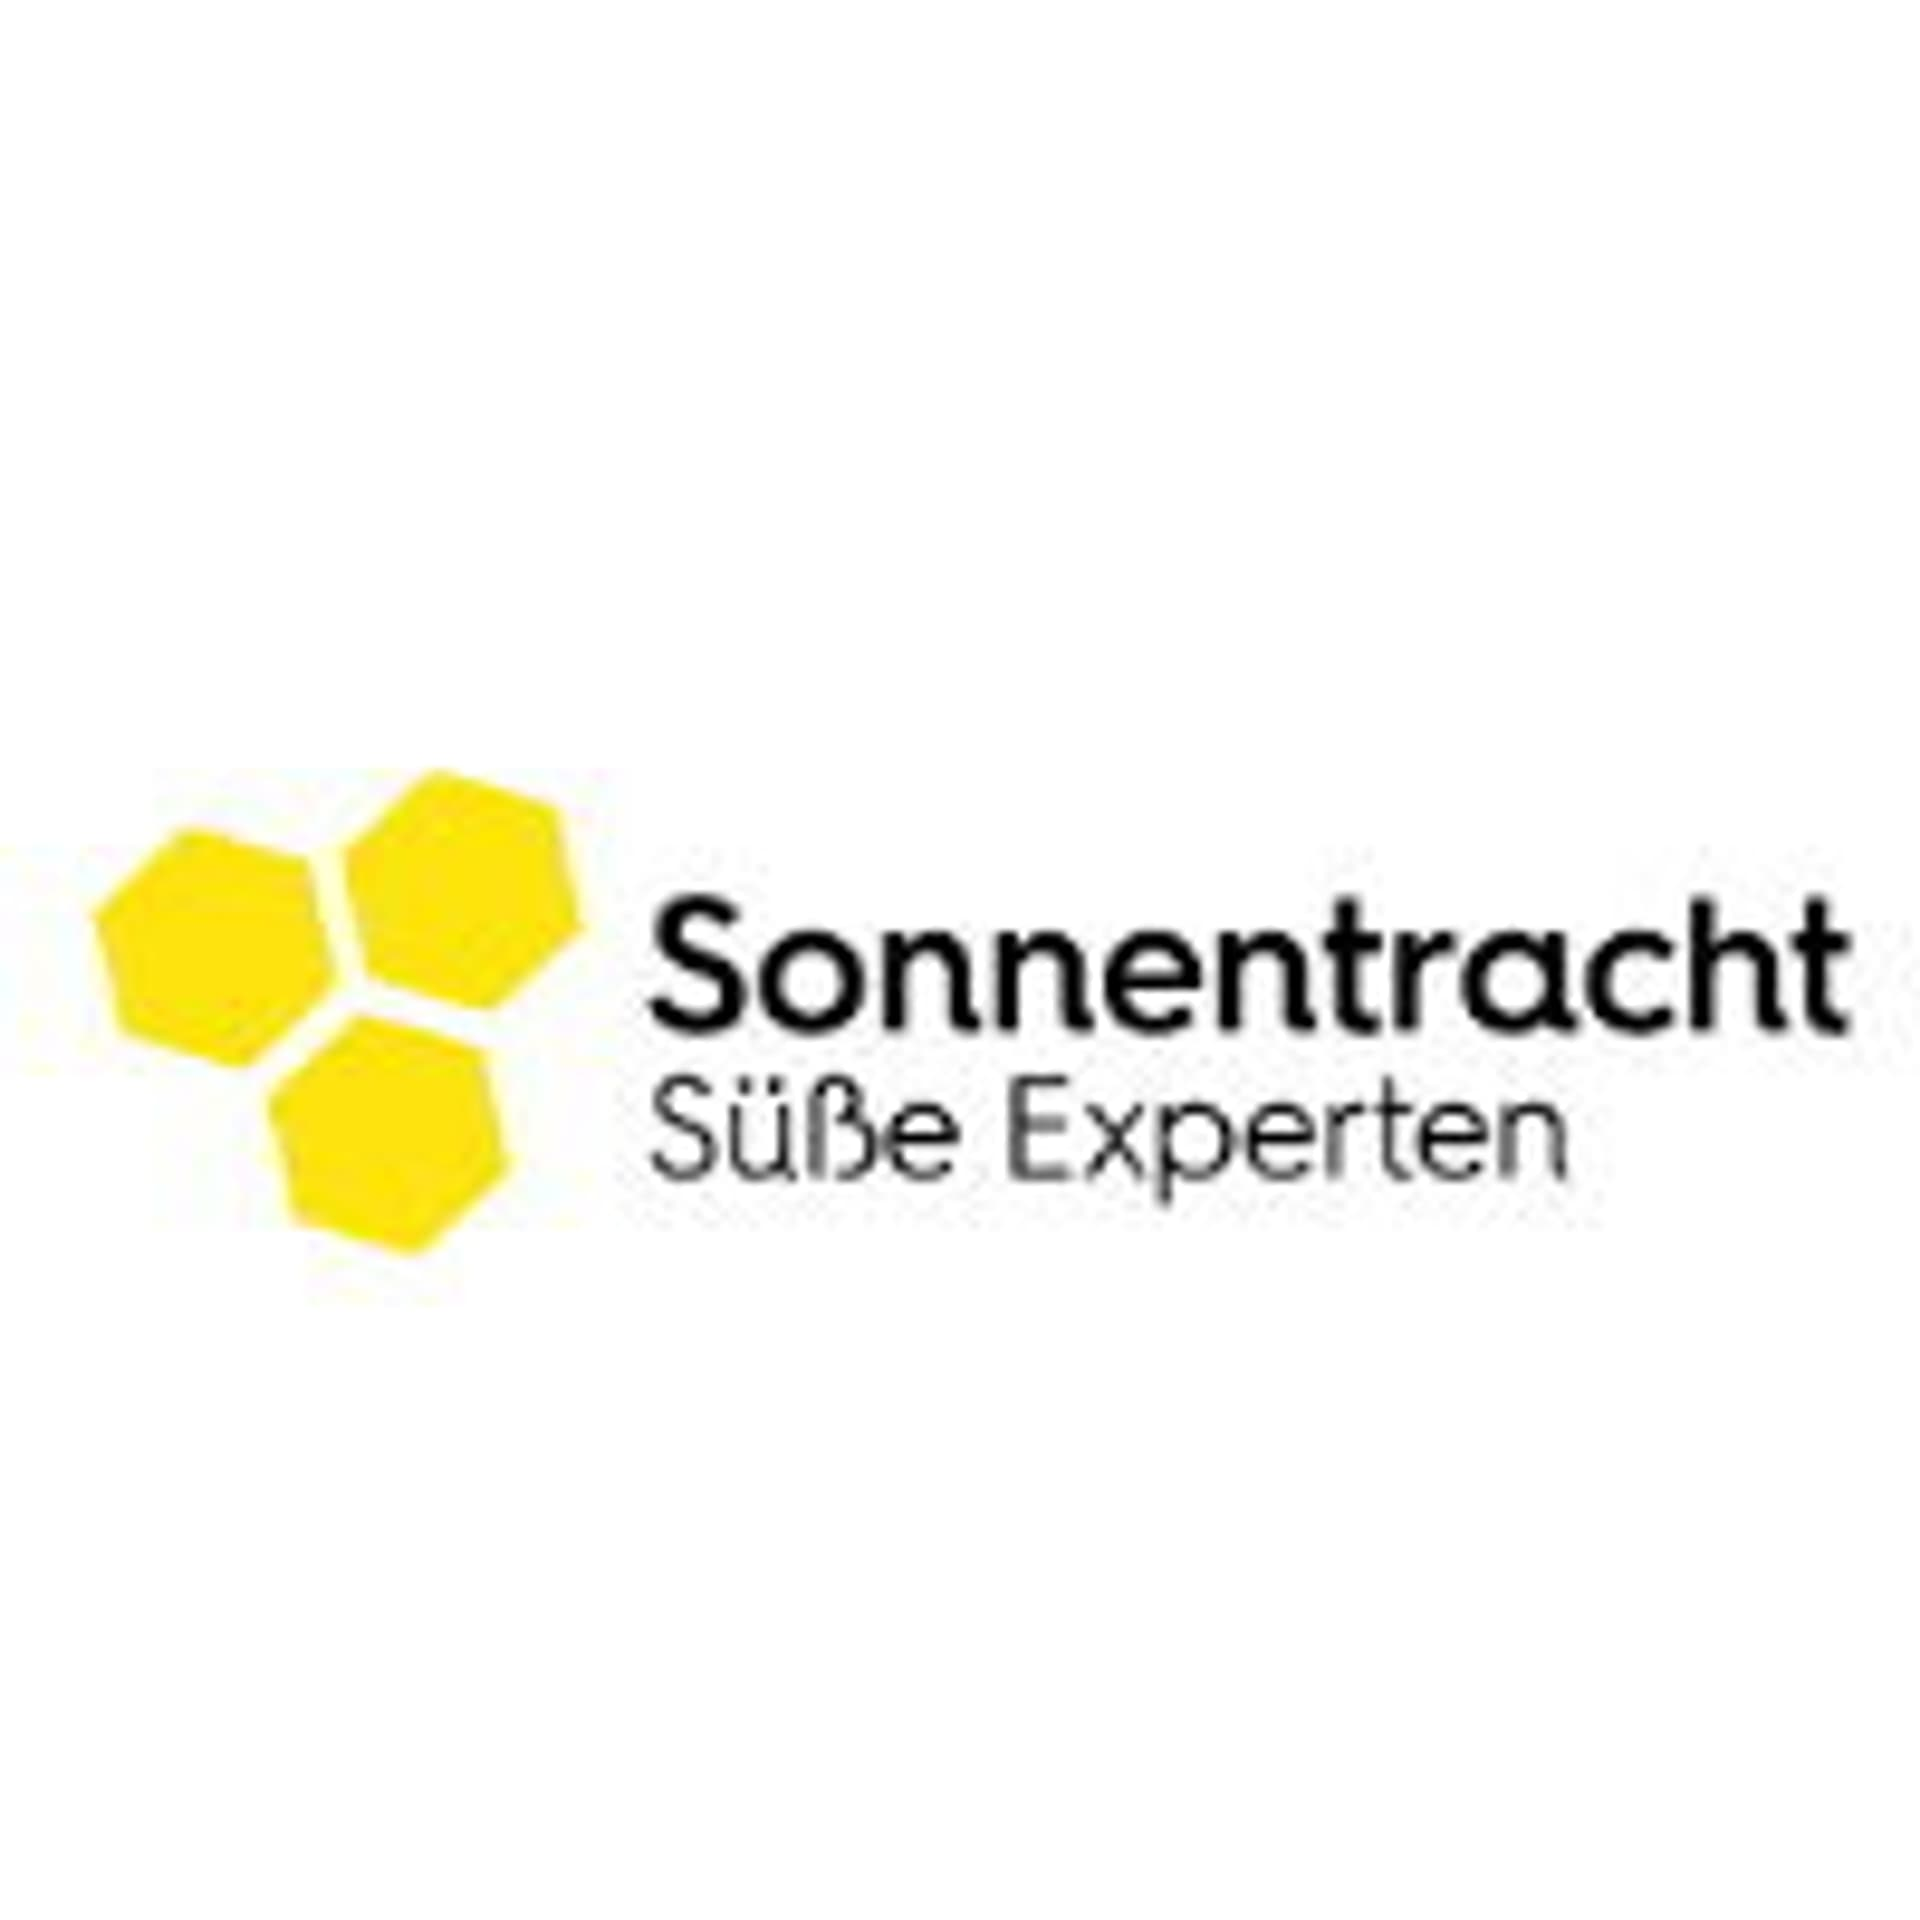 Sonnentracht Logo